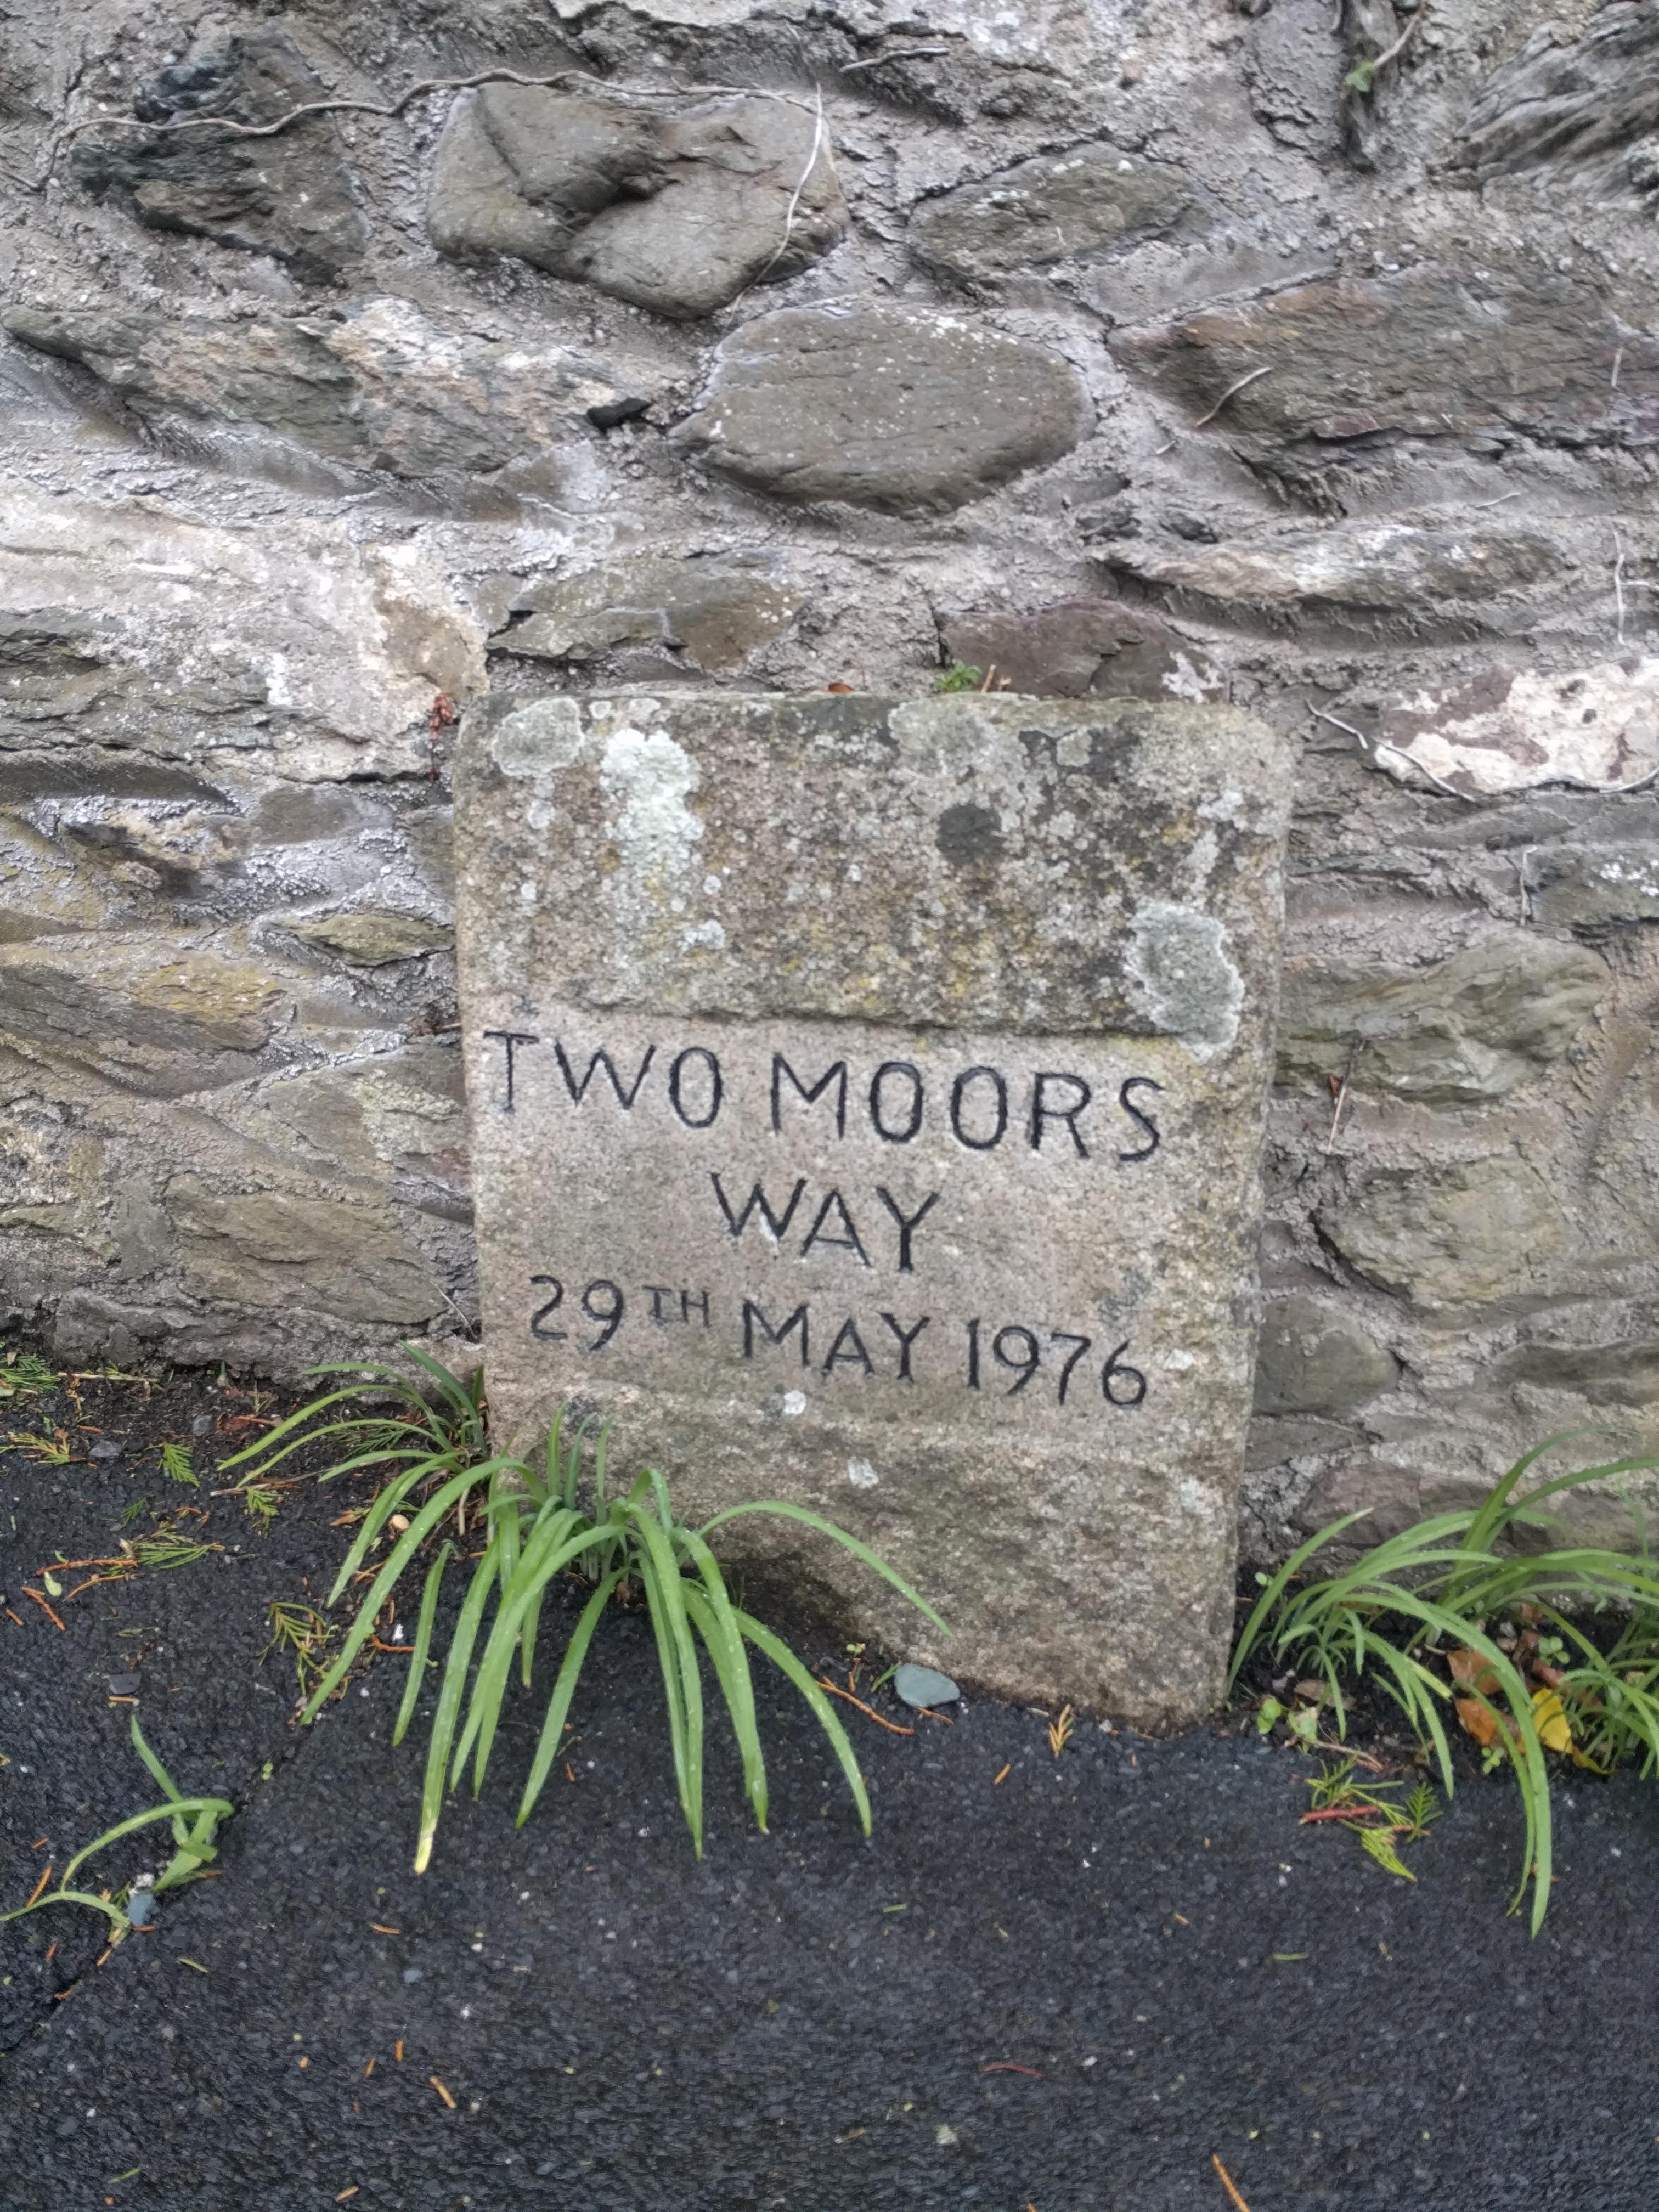 Marker stone near start #sh #twomoorsway #DevonC2C